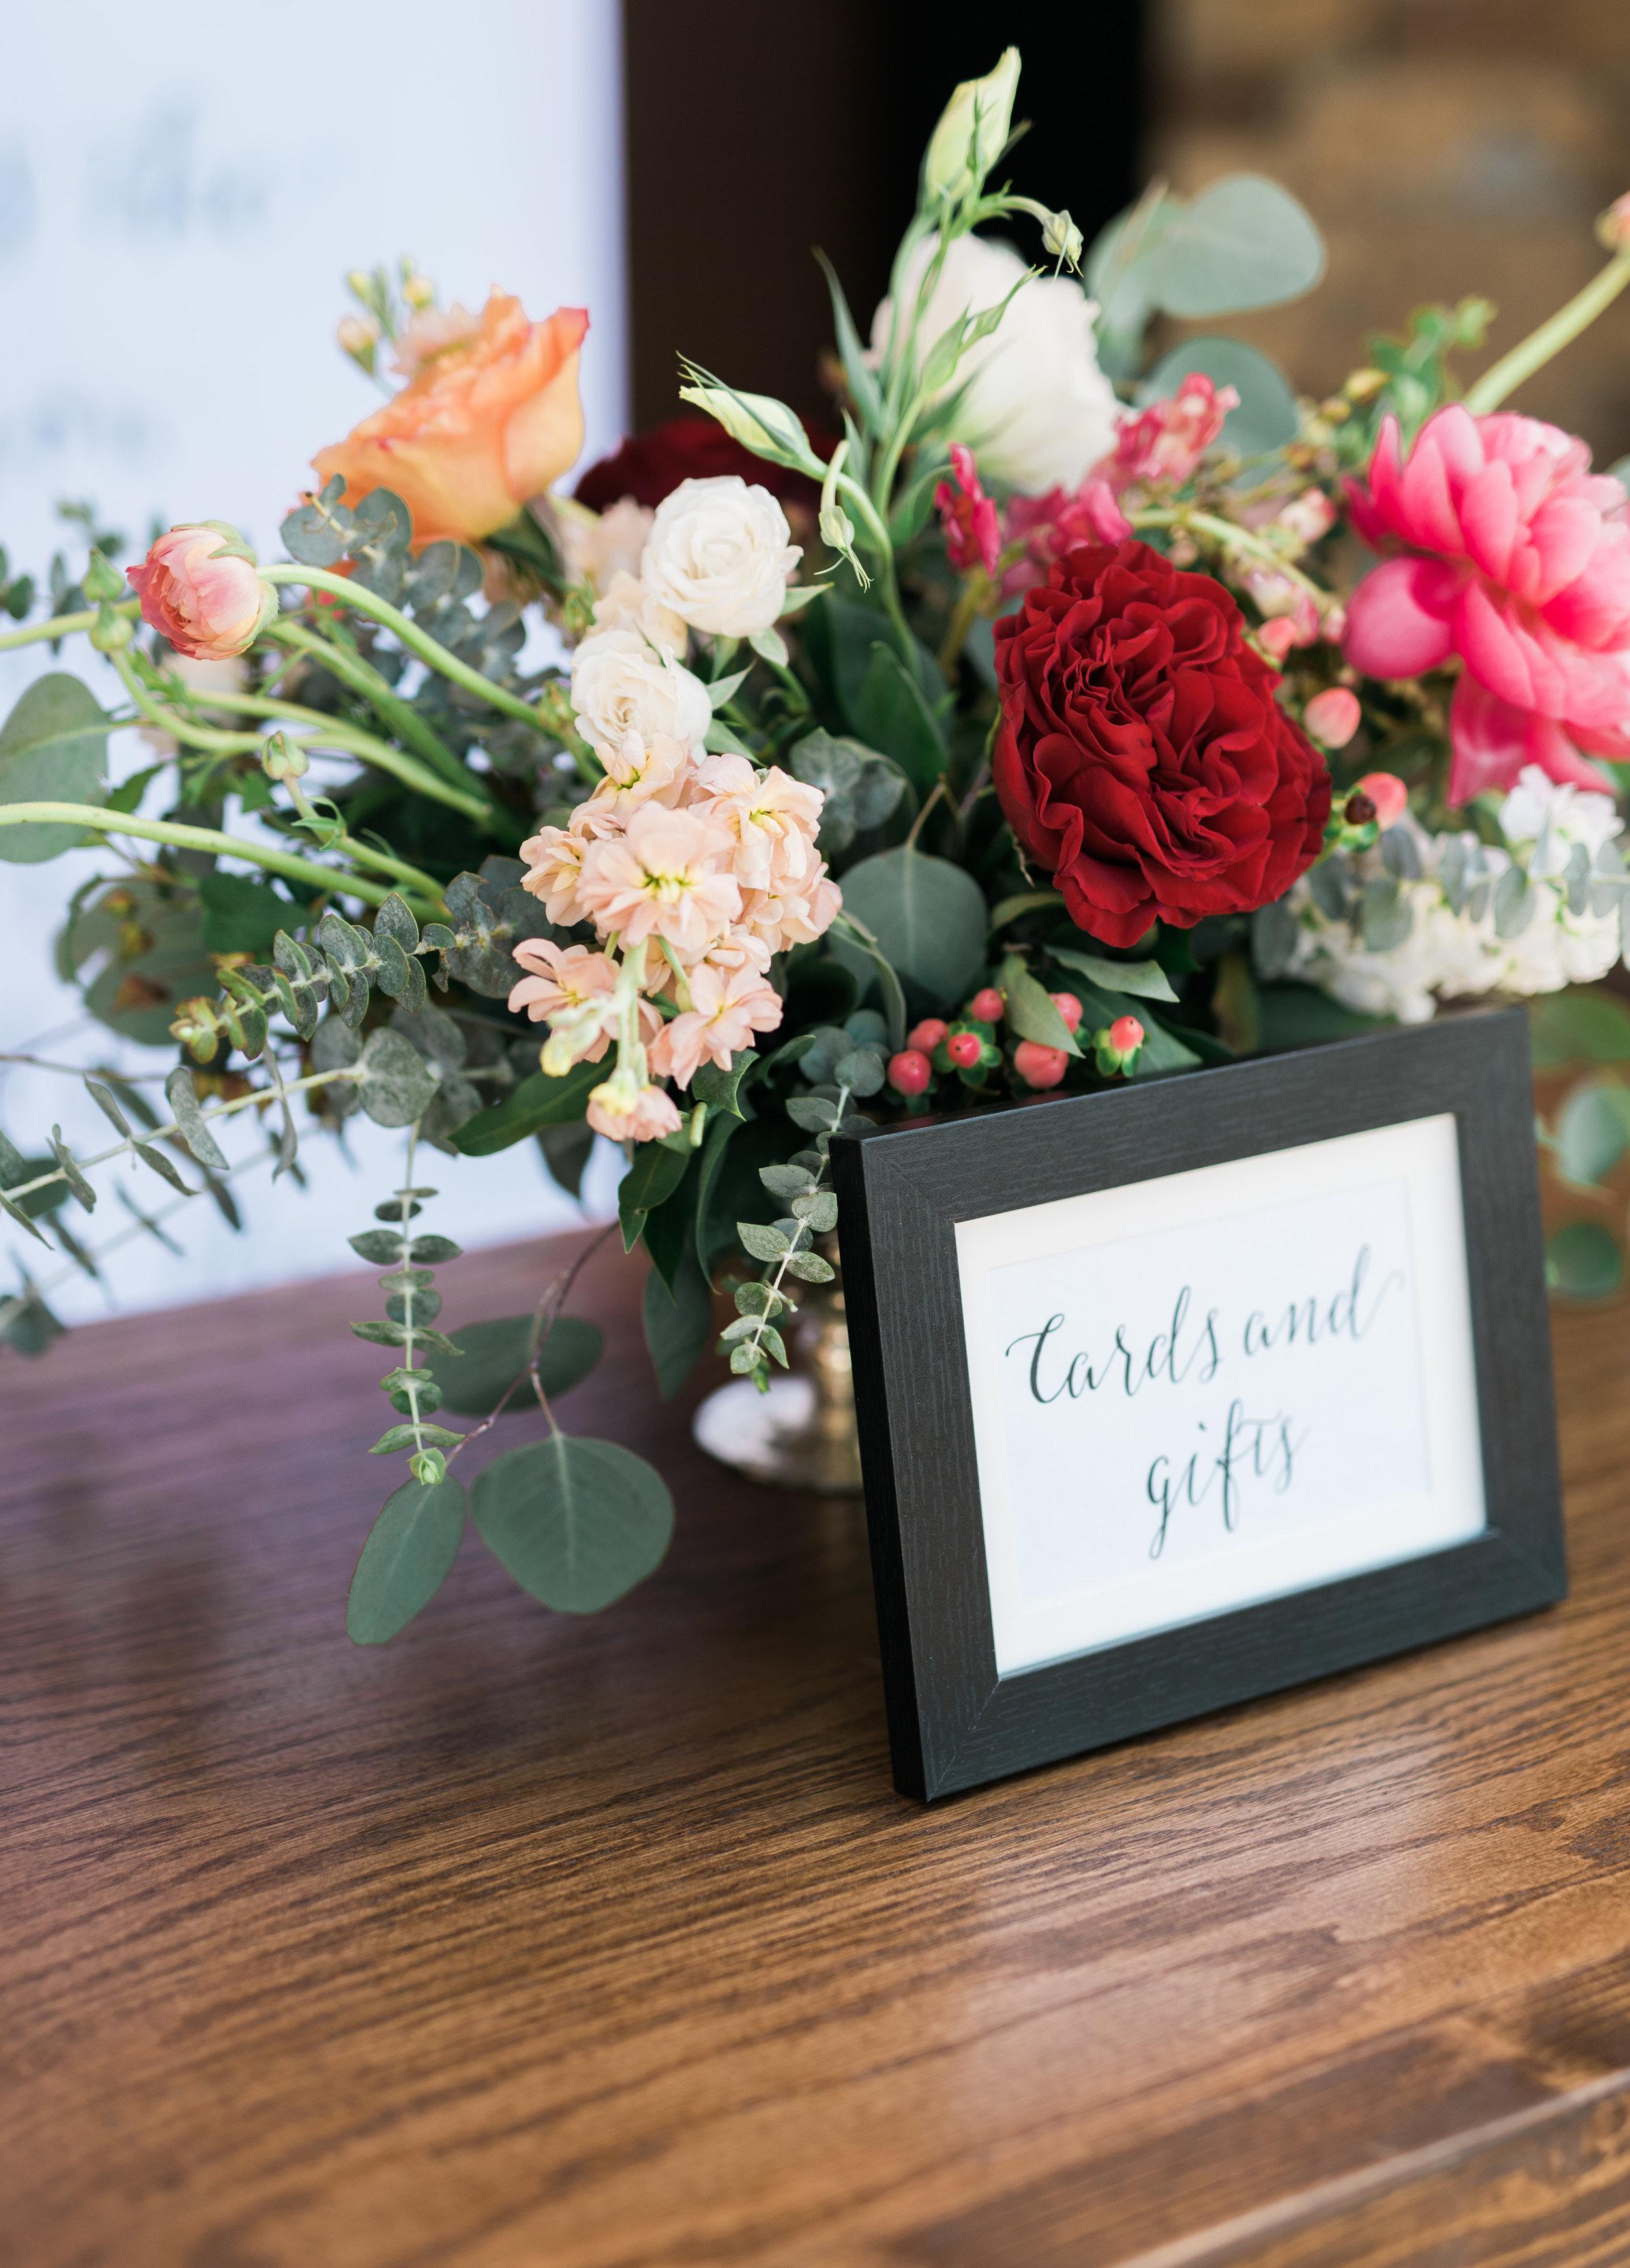 wedding gift table, wedding flowers, blush wedding flowers, red wedding flowers, peach wedding flowers, ivory wedding flowers